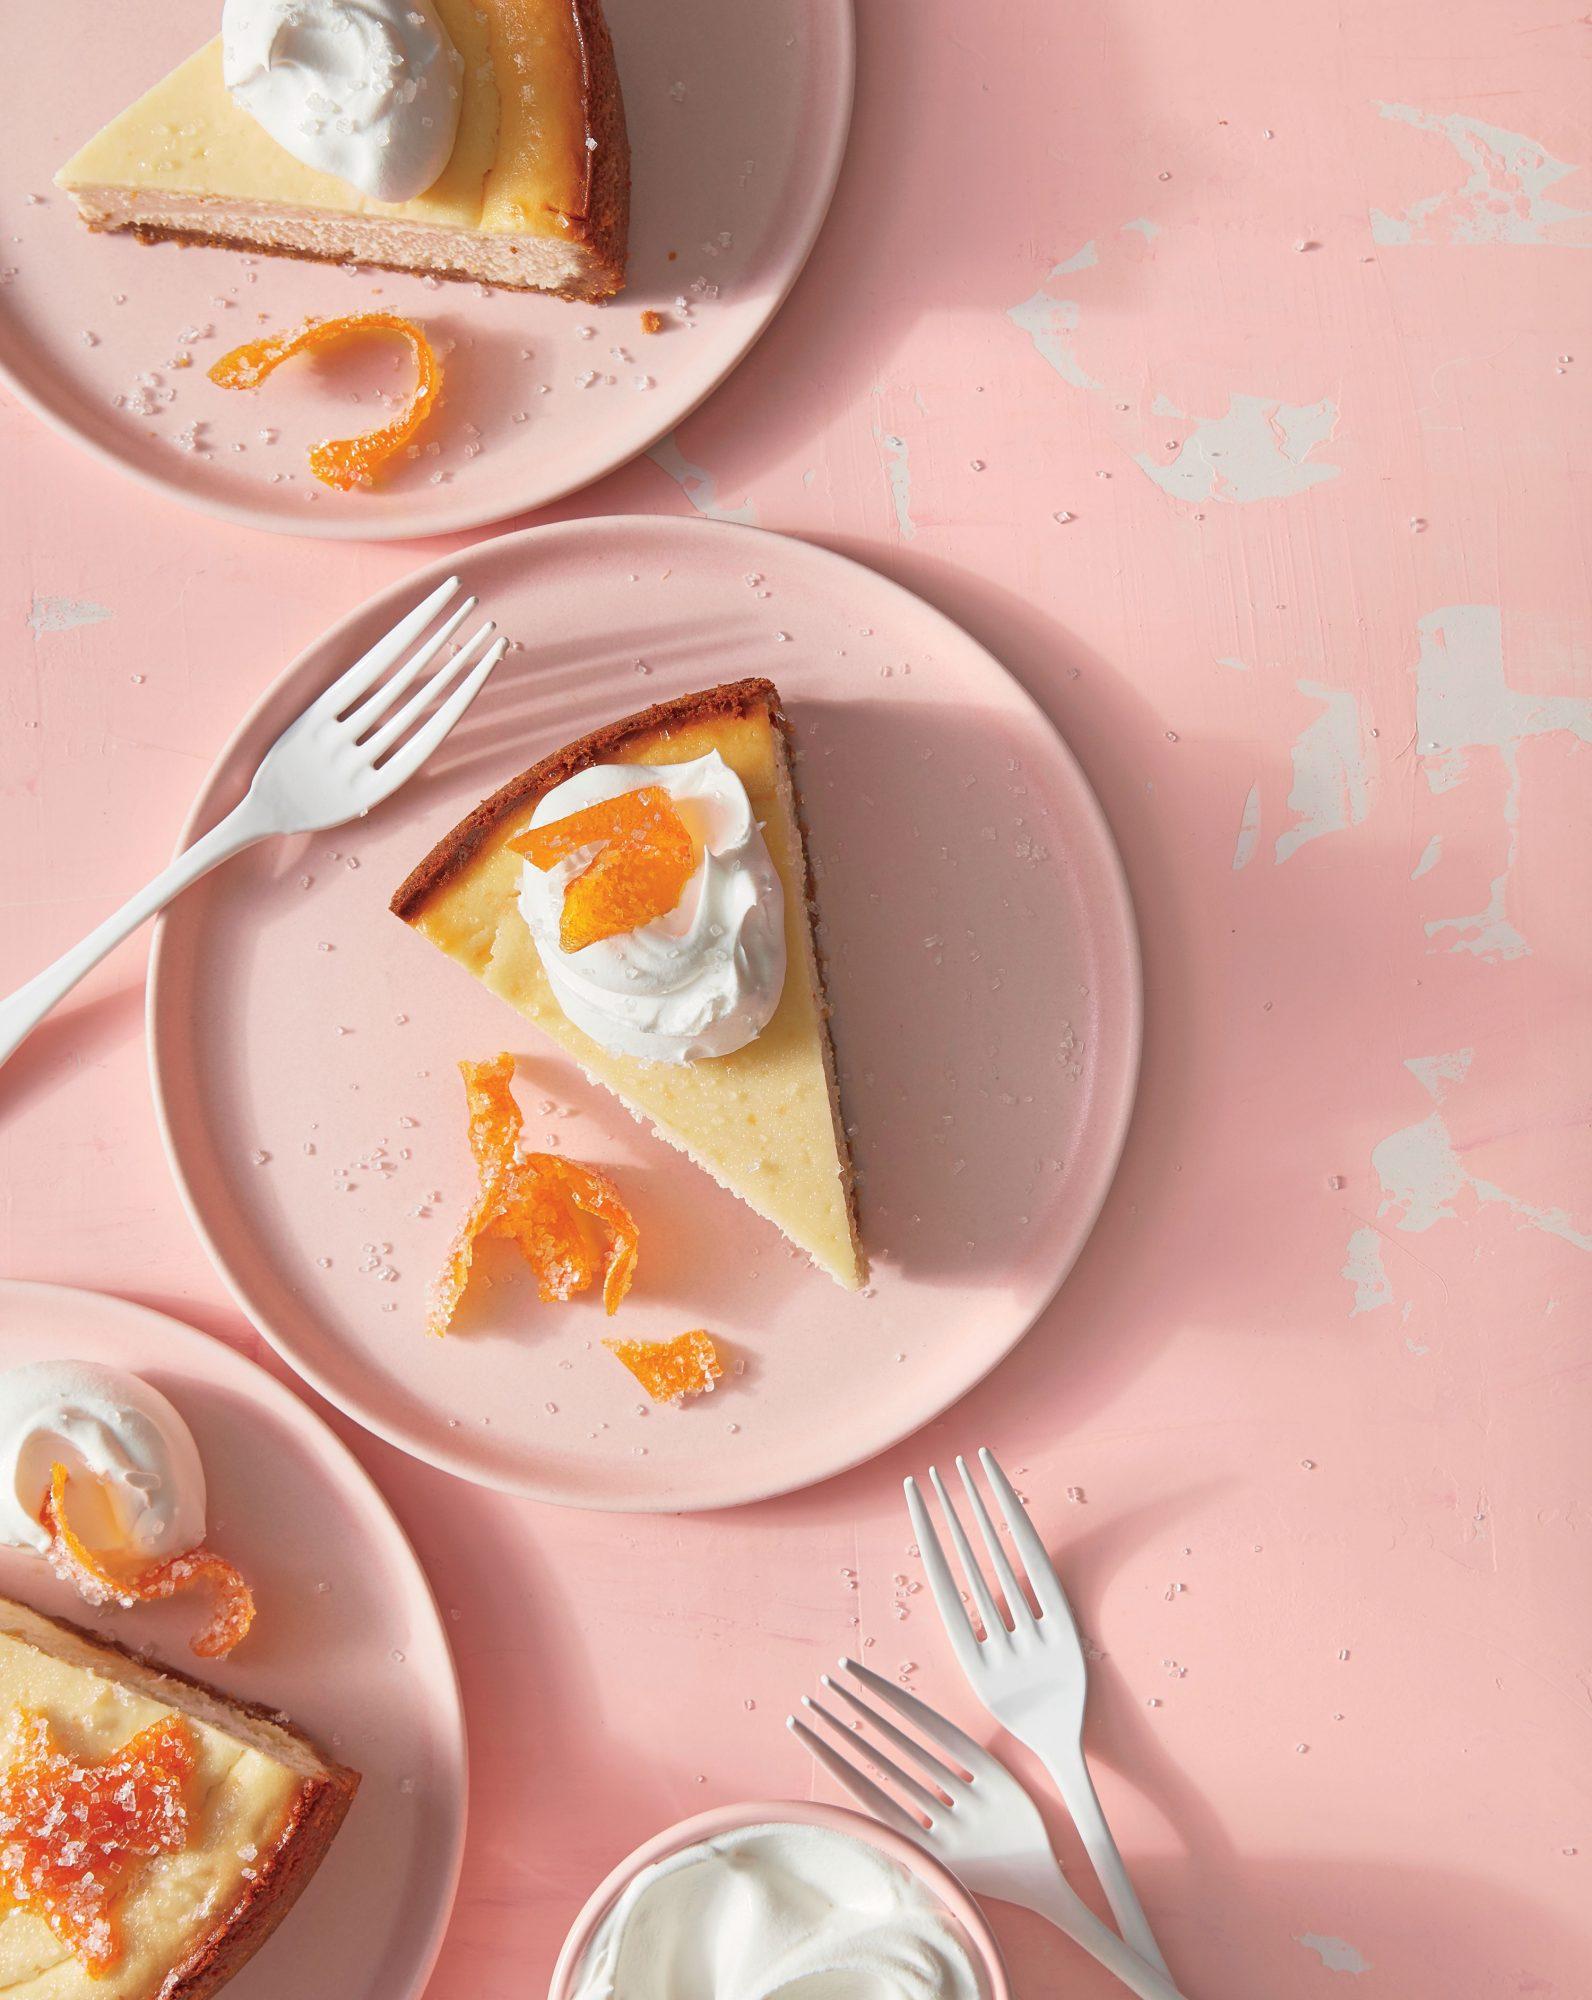 Gingered-Grapefruit Cheesecake image